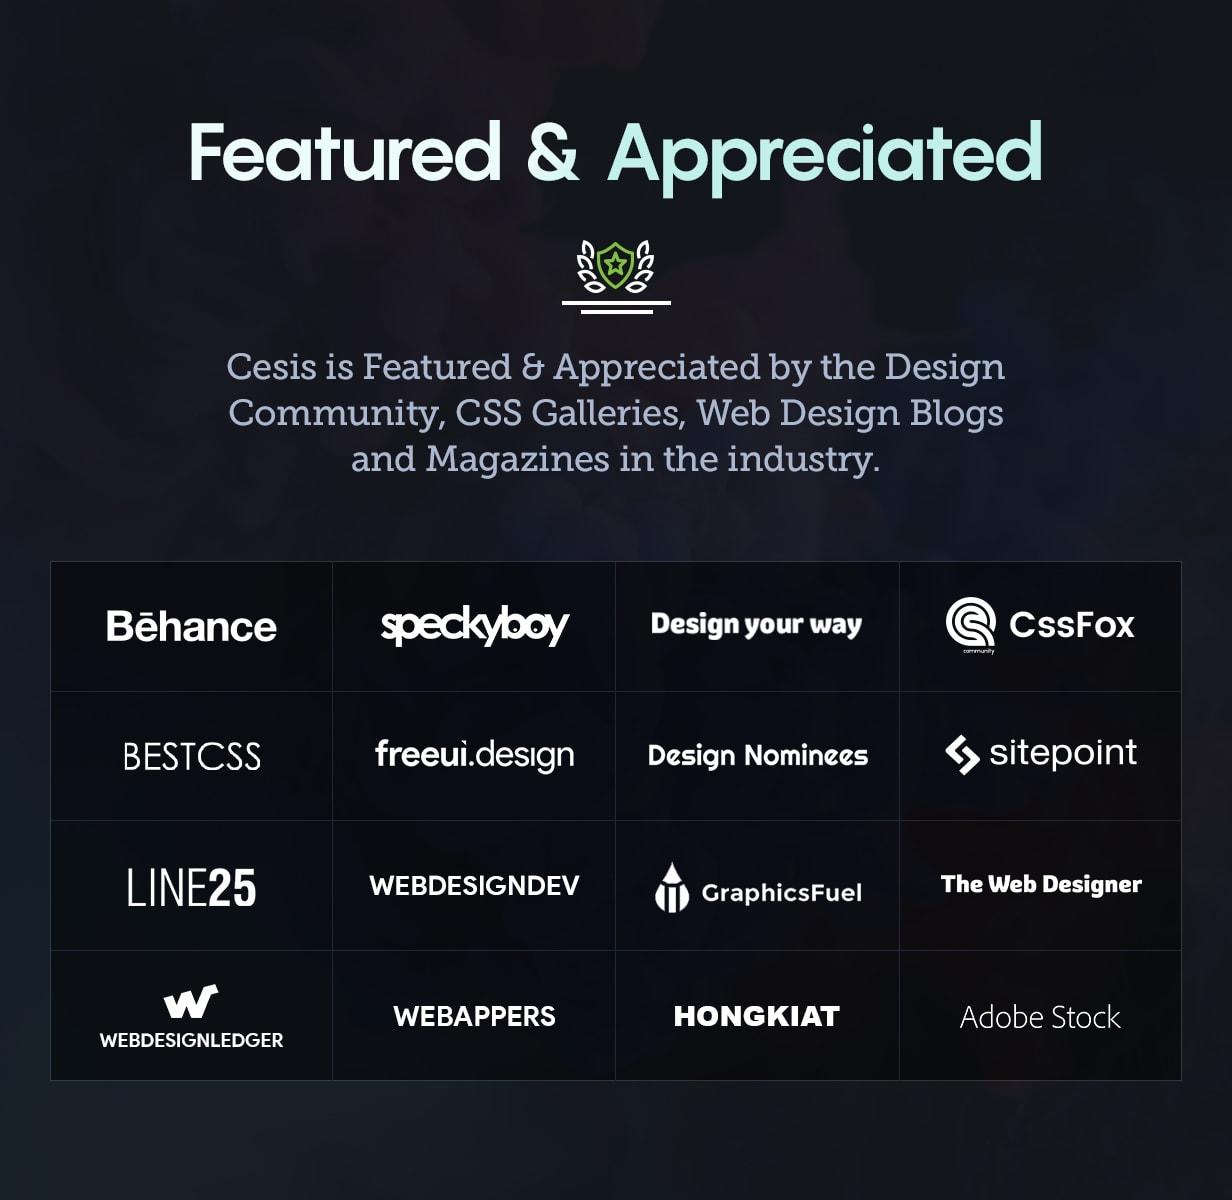 Cesis WP Featured Appreciated 24 Jul 2018 - Cesis   Responsive Multi-Purpose WordPress Theme